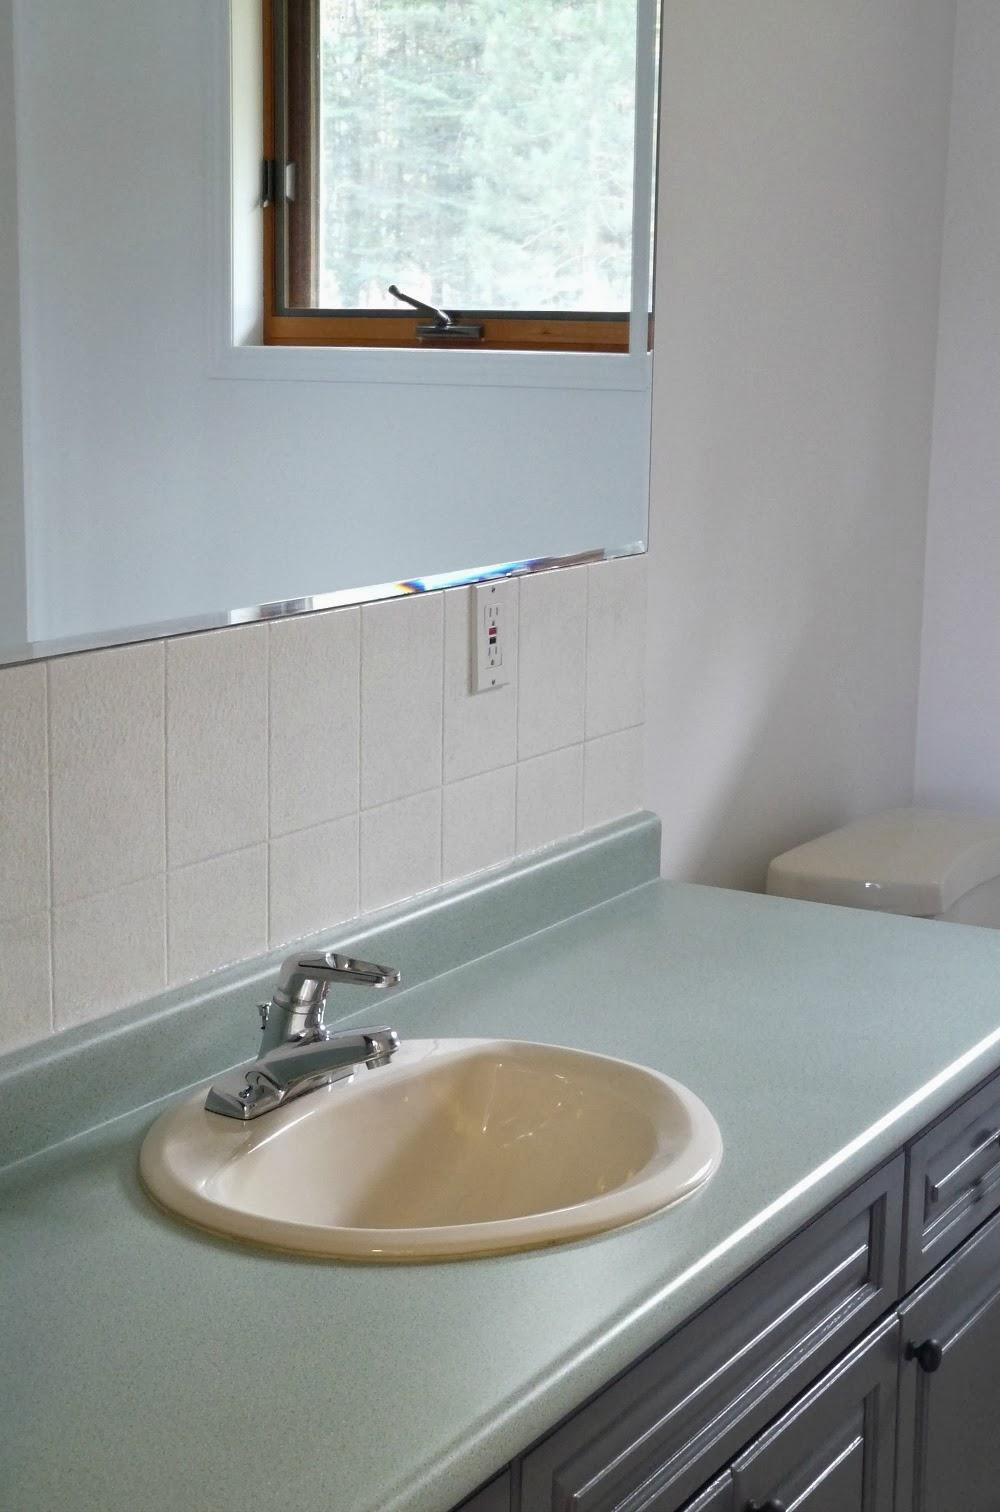 Bathroom Before After Dans Le Lakehouse